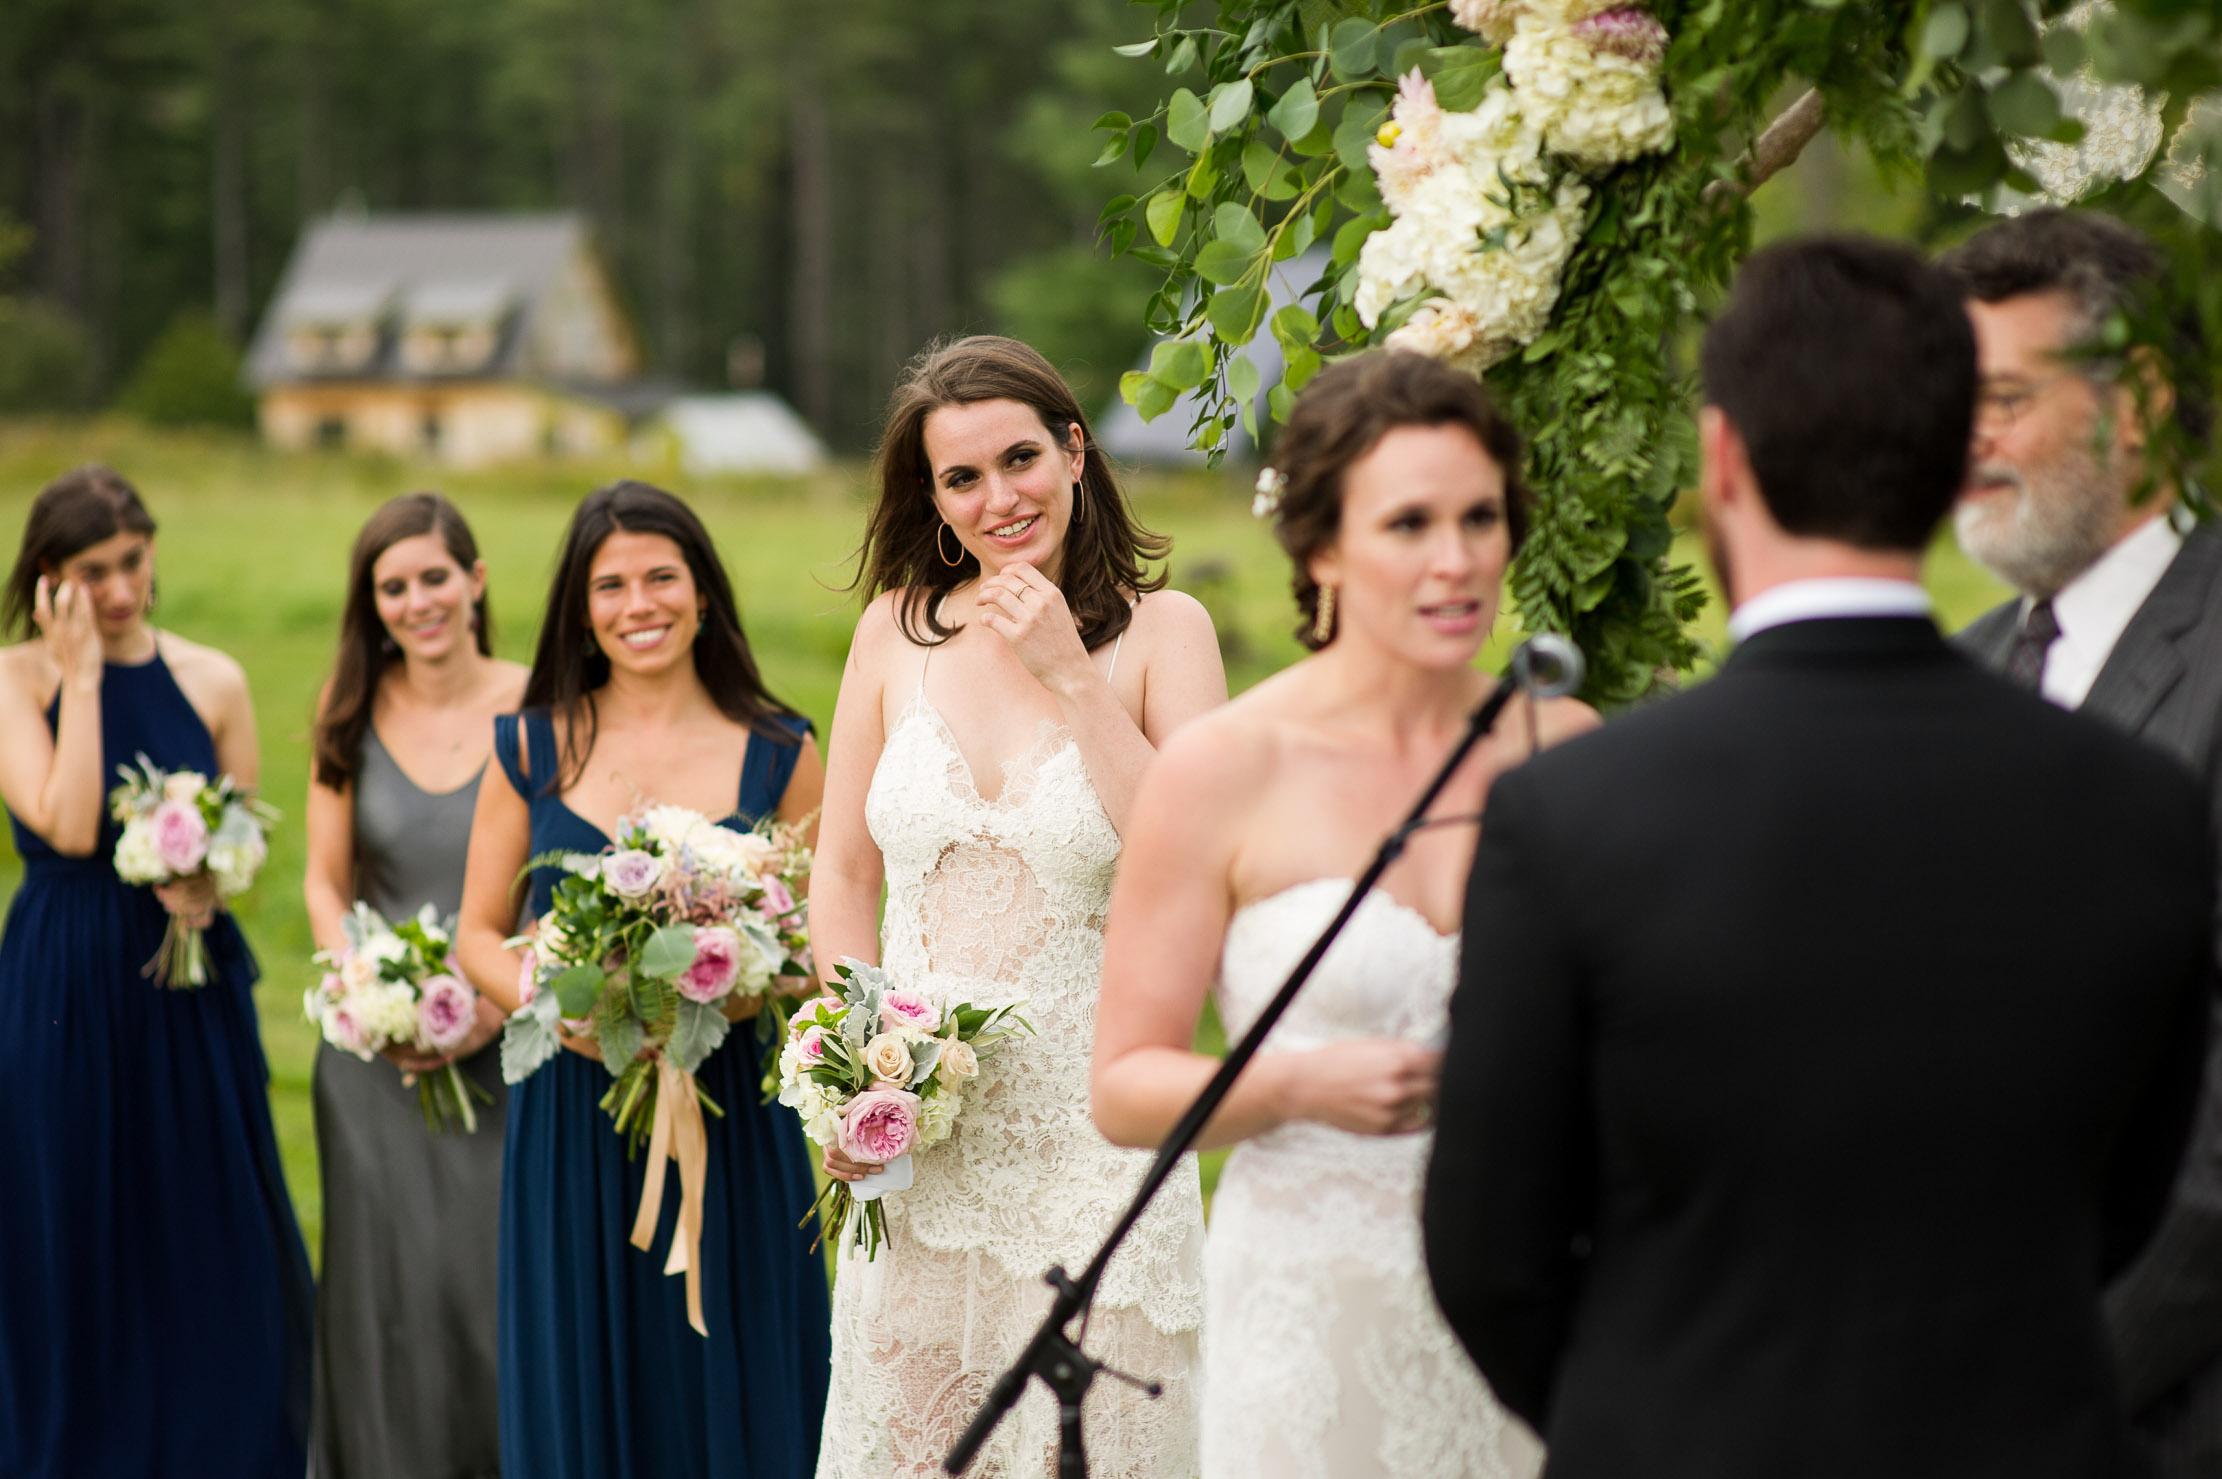 VERMONT-BARN-NYC-WEDDING-PHOTOGRAPHER-1072.jpg